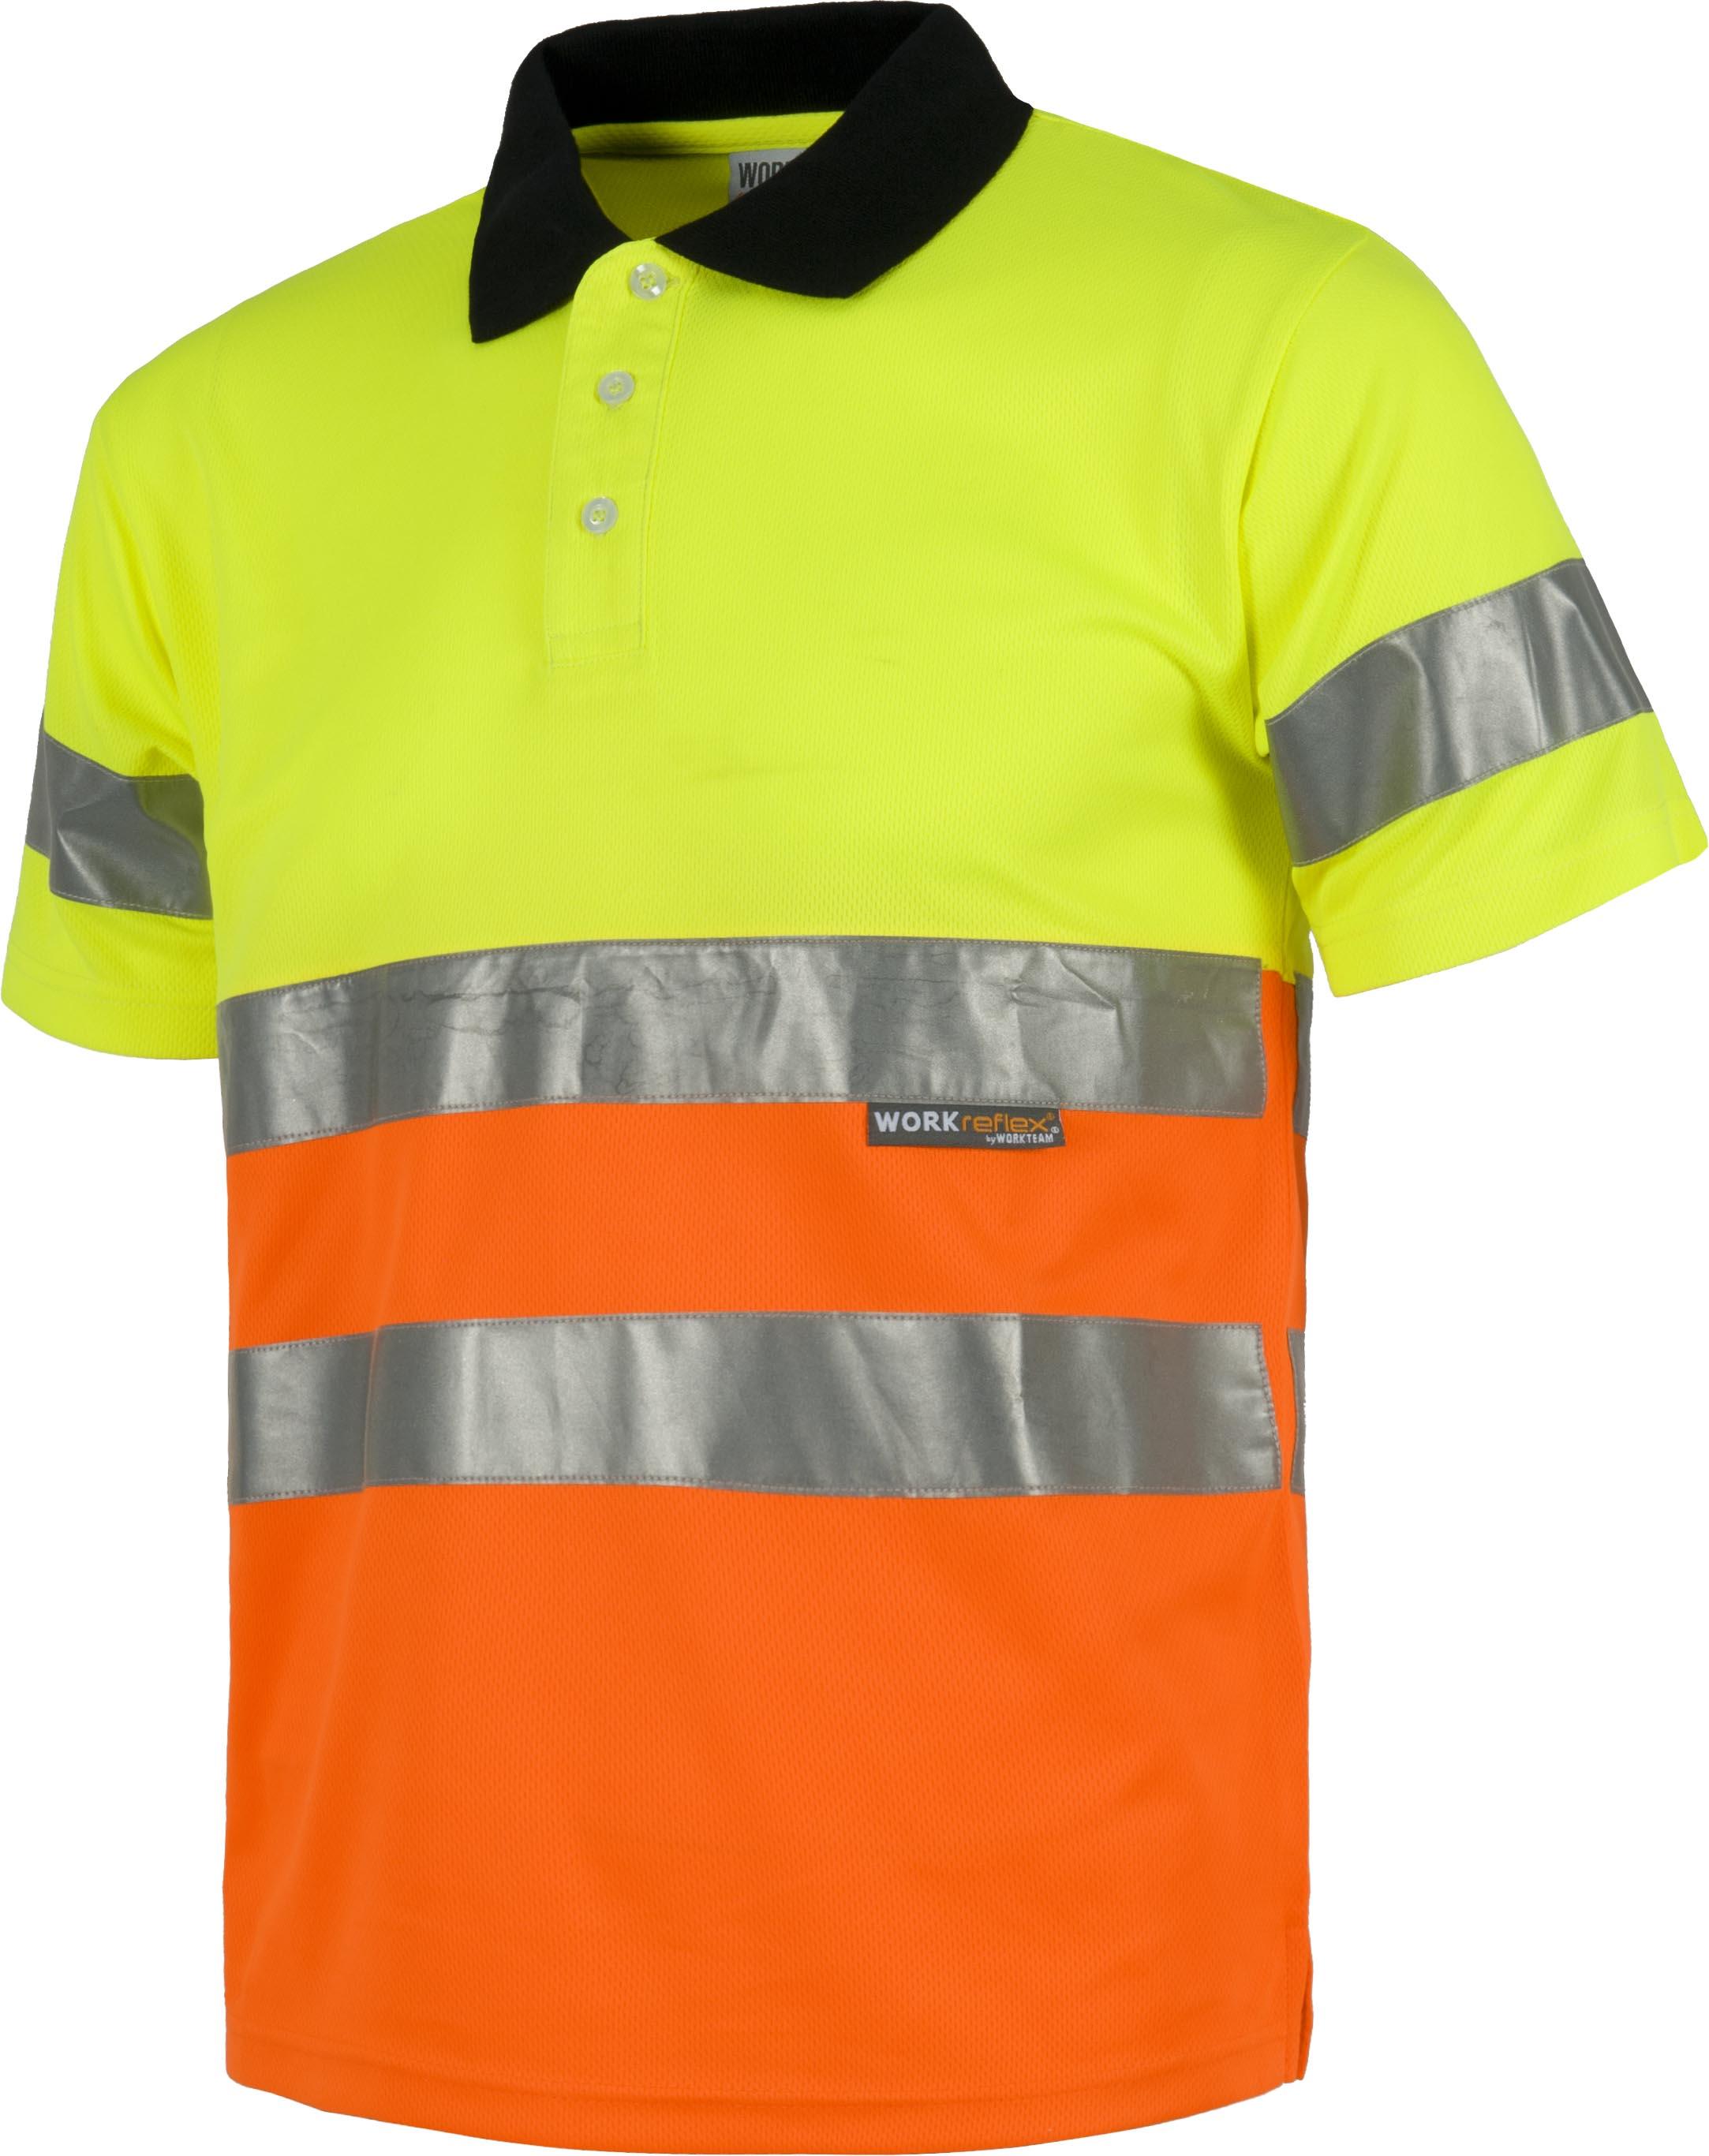 7126717bae0 Polo reflectante alta visibilidad C3866 | Borda Logos | Ropa laboral ...